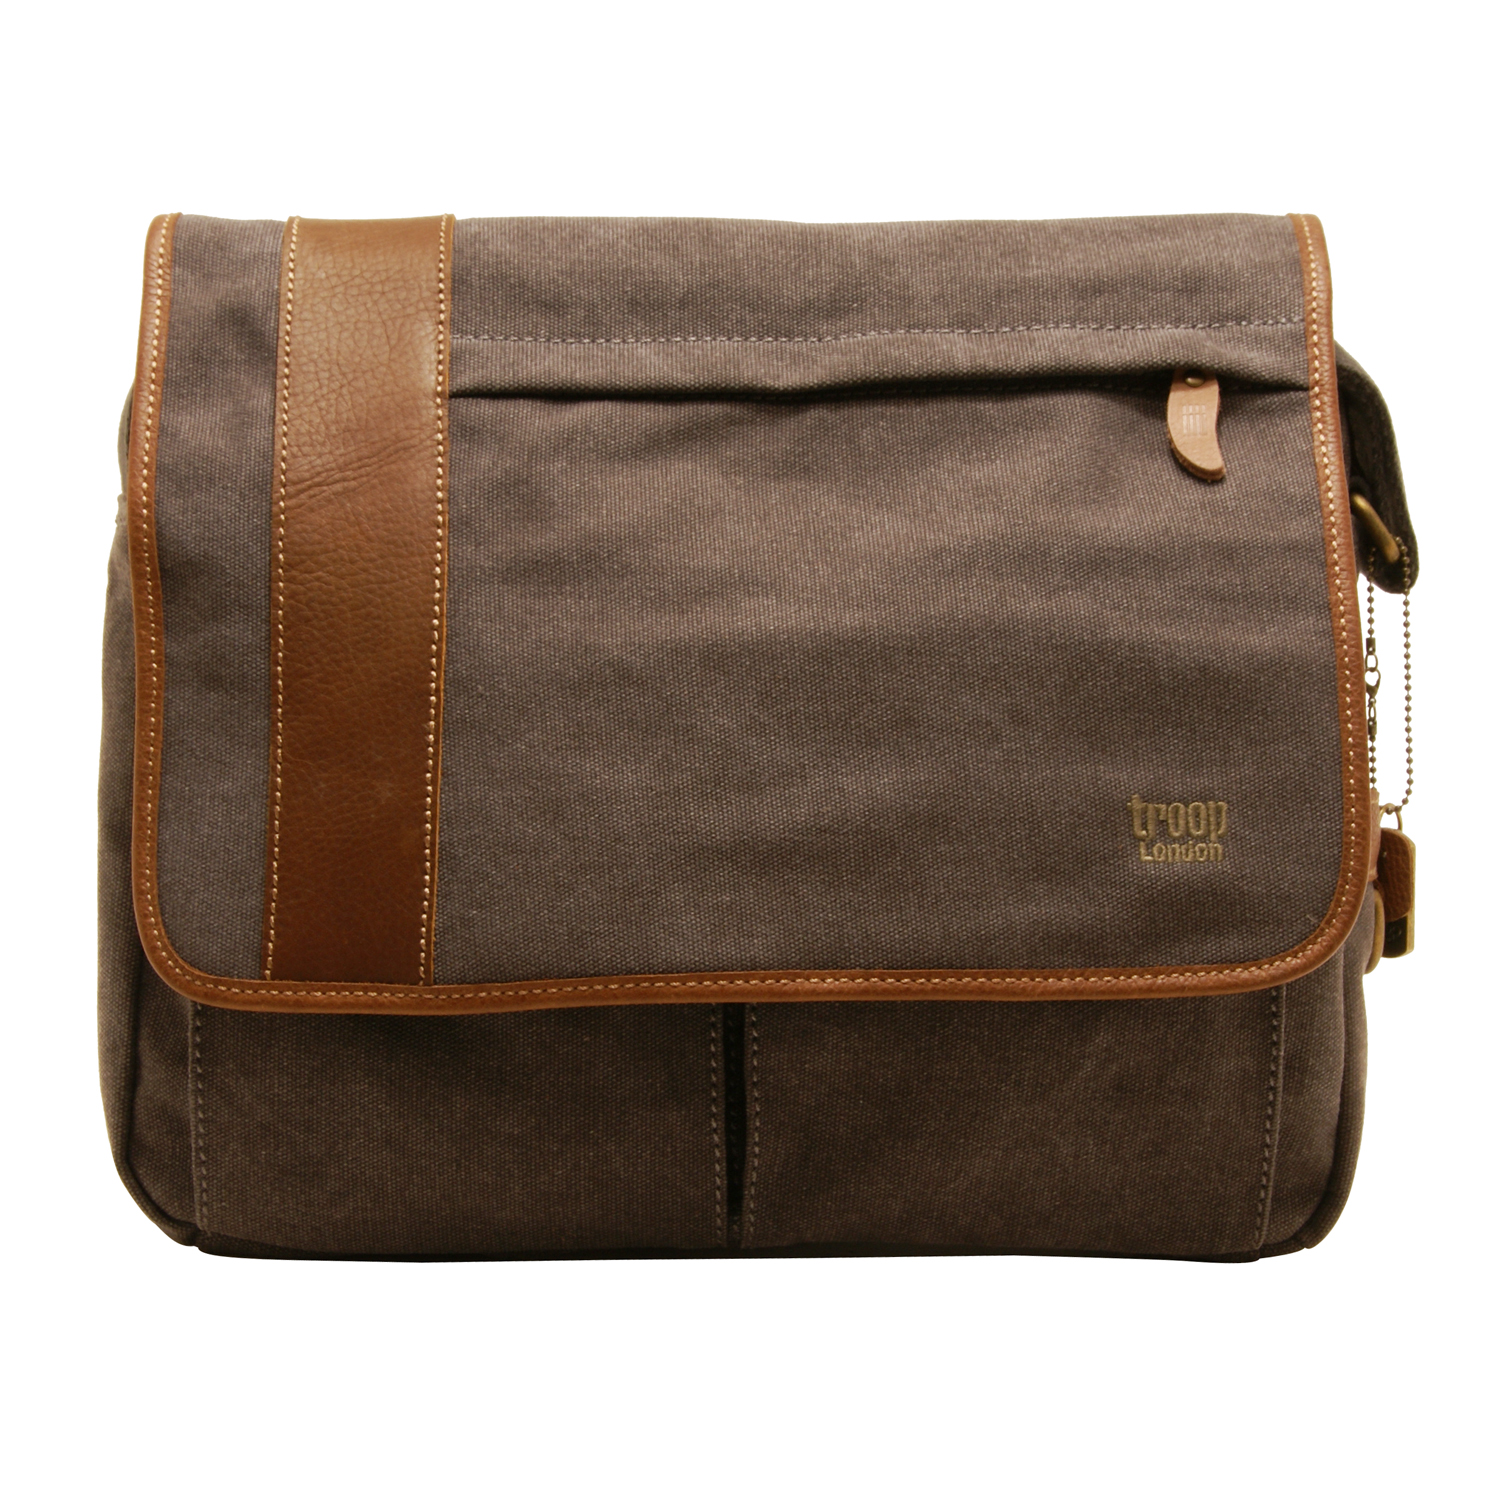 Troop London – Black Heritage Messenger Bag in Canvas-Leather